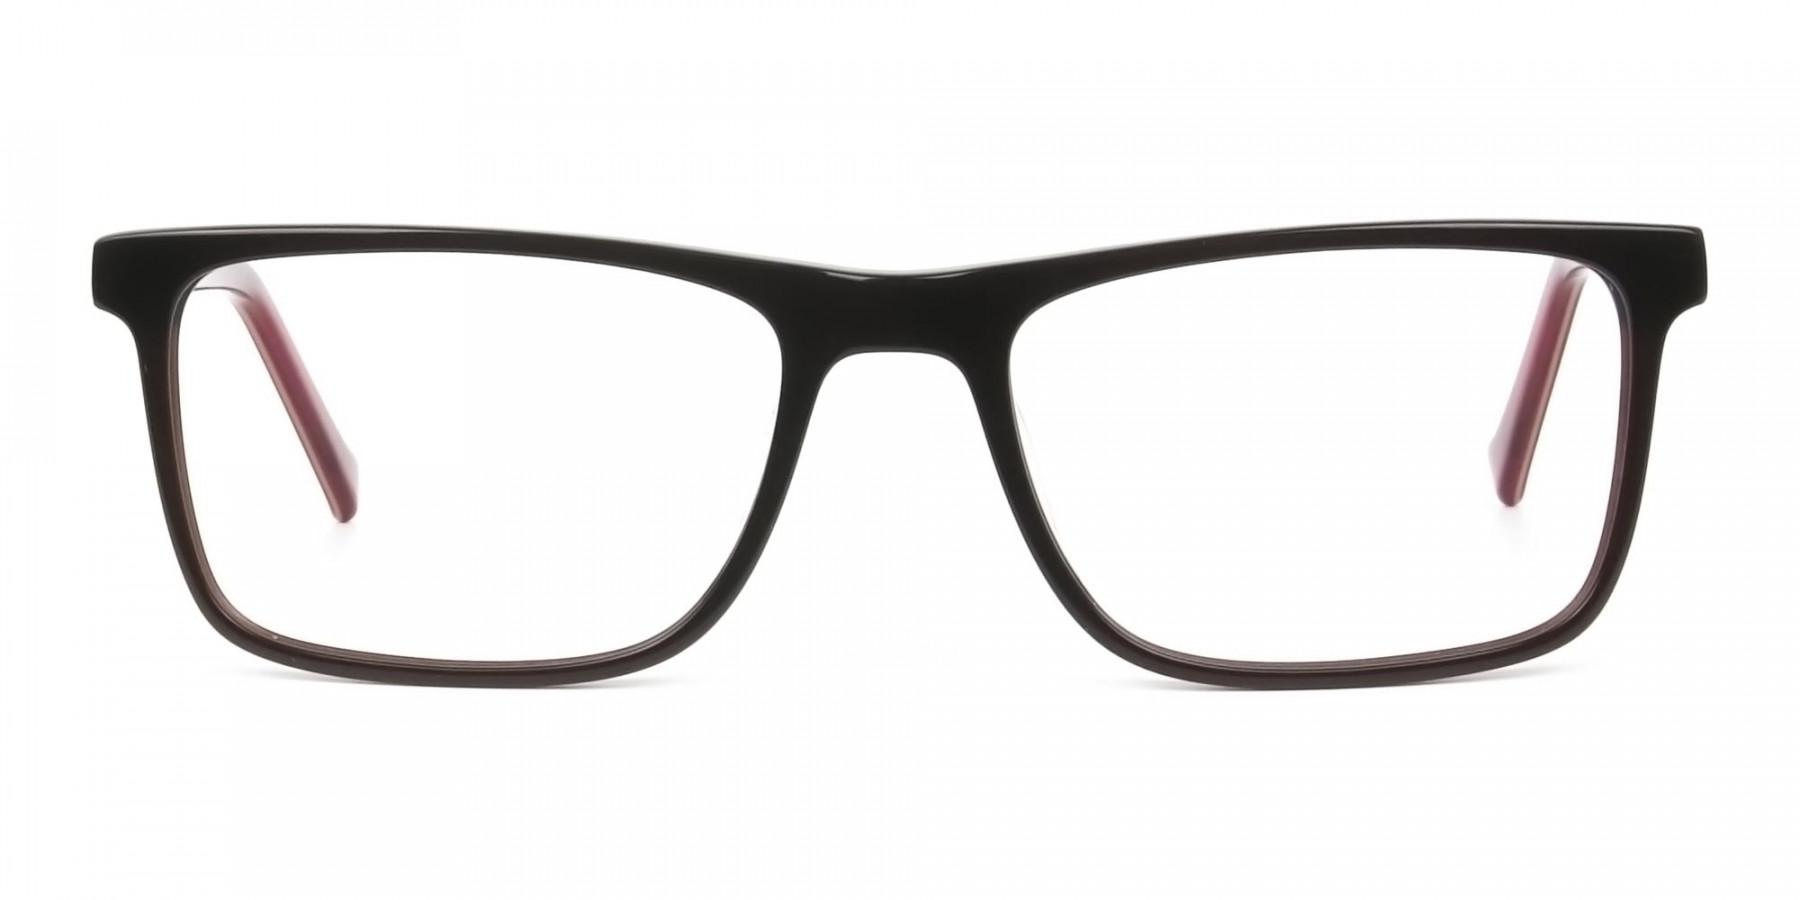 Round Temple Tip Dark Brown & Red Glasses in Rectangular - 1